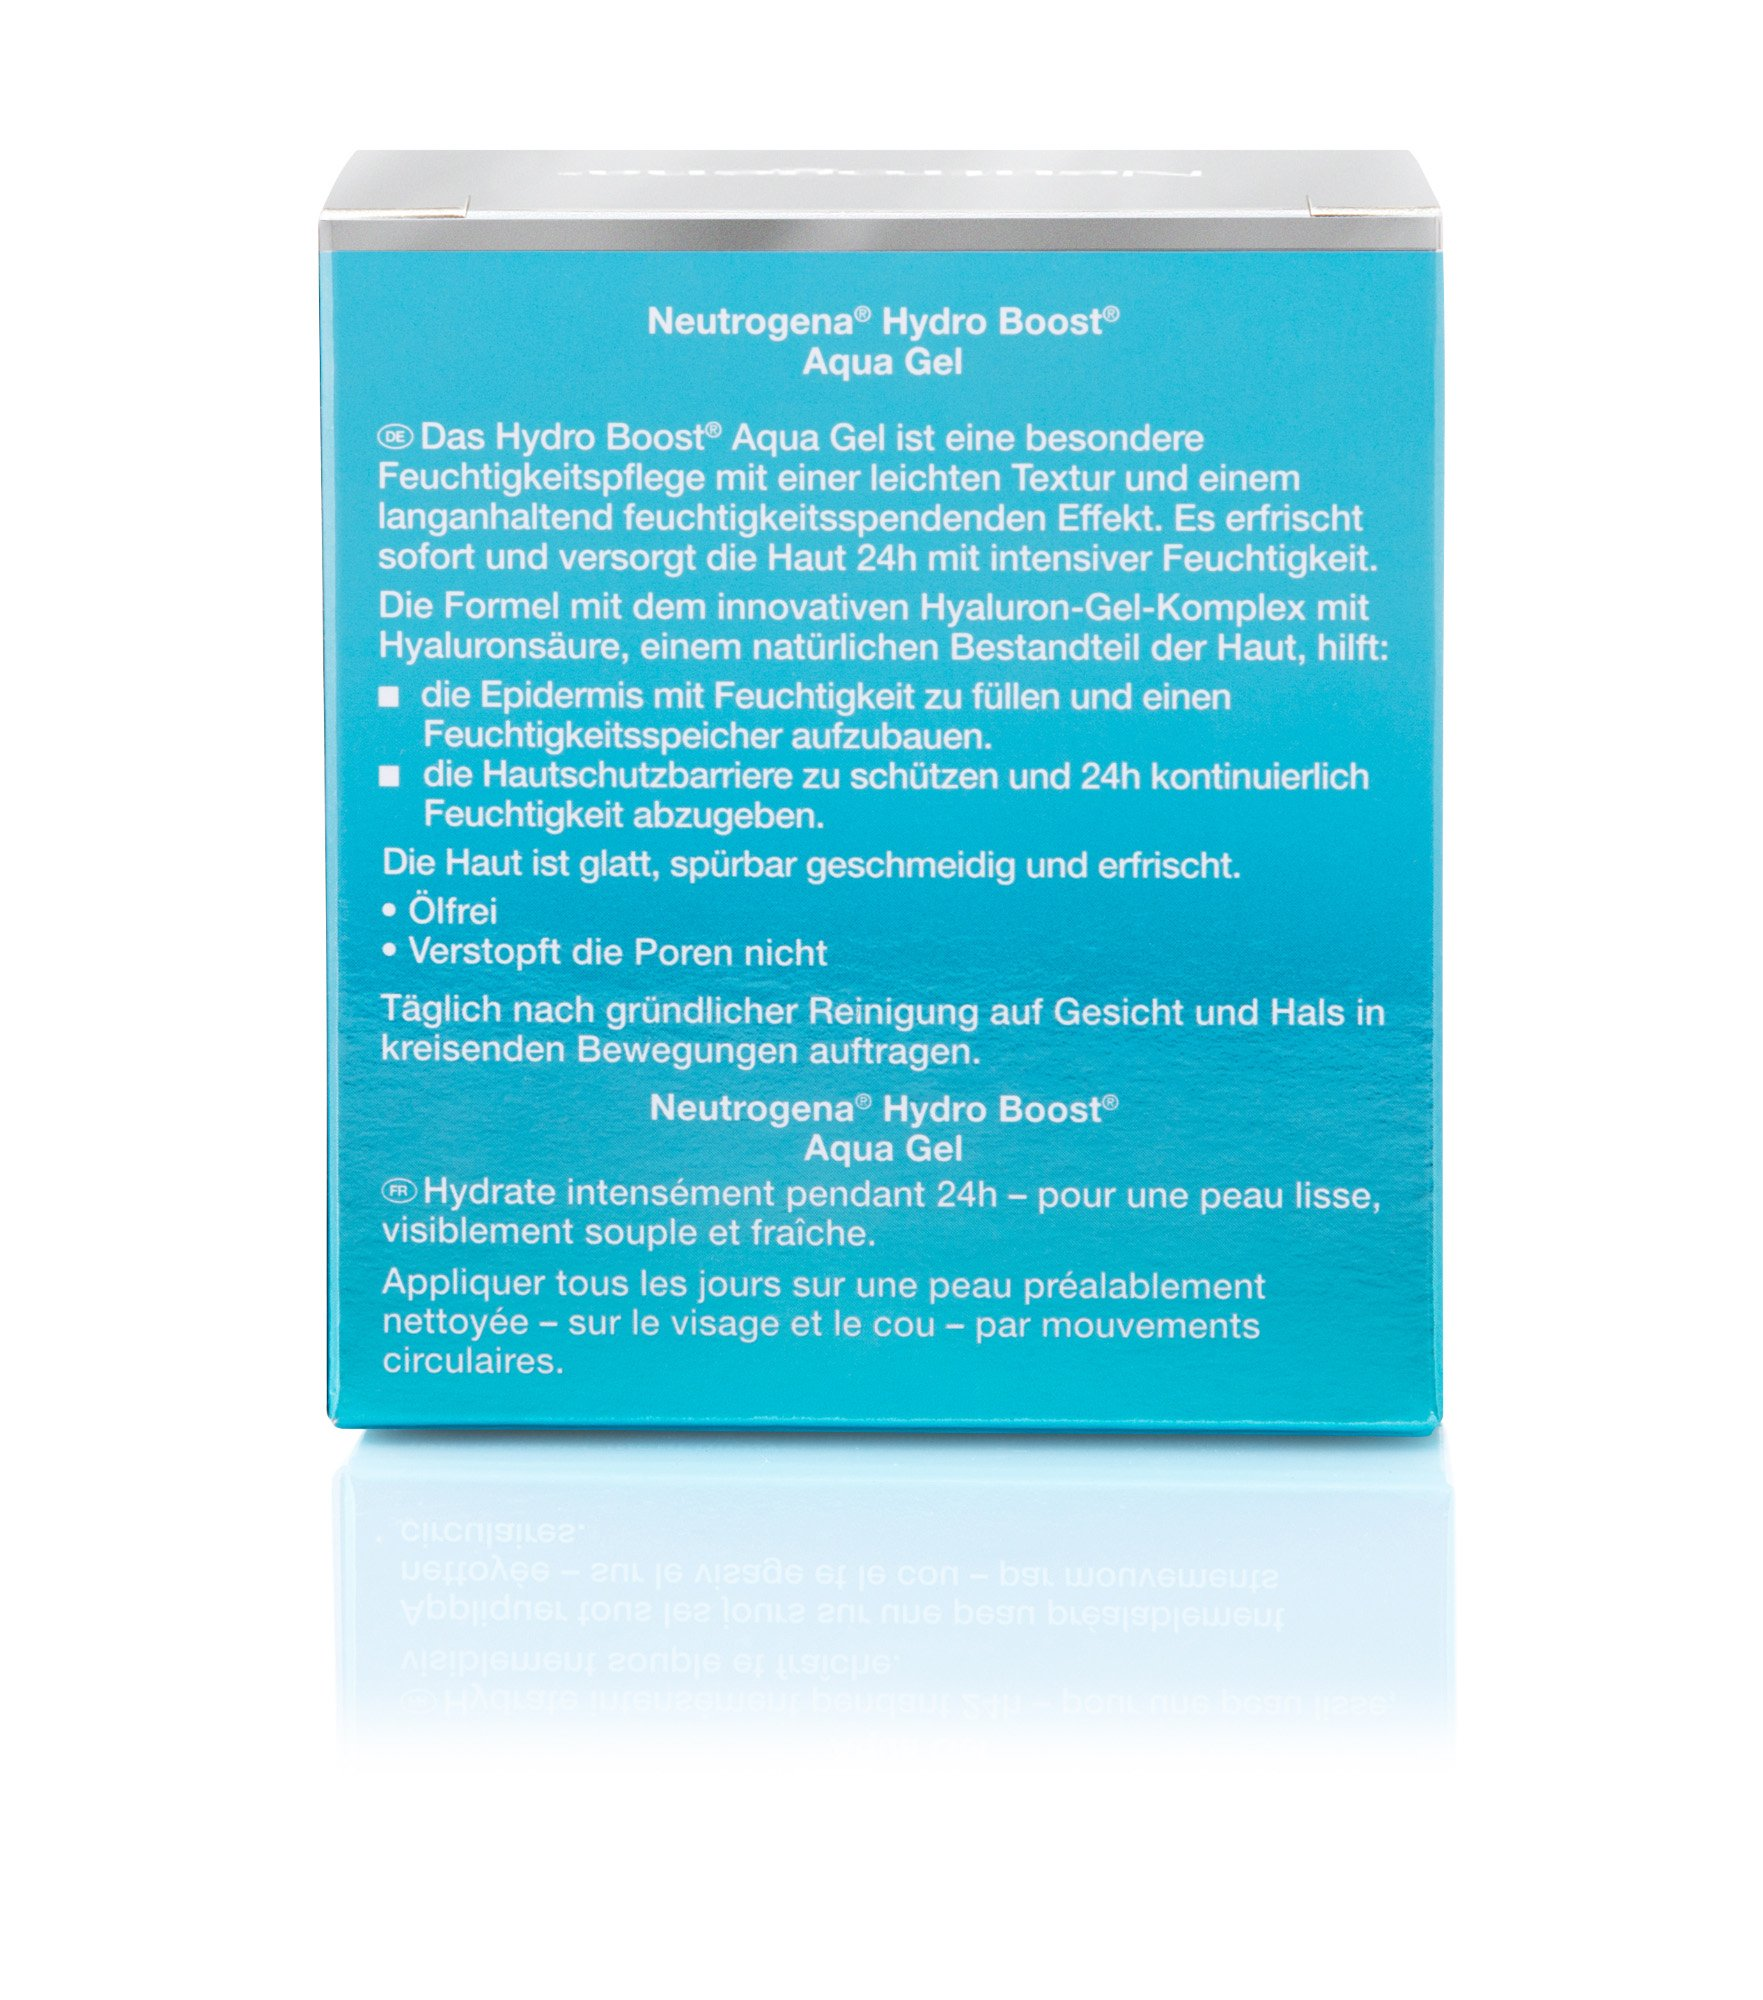 Neutrogena Hydro Boost Aqua Gel (Piel Normal Y Mixta) – 50 ml.